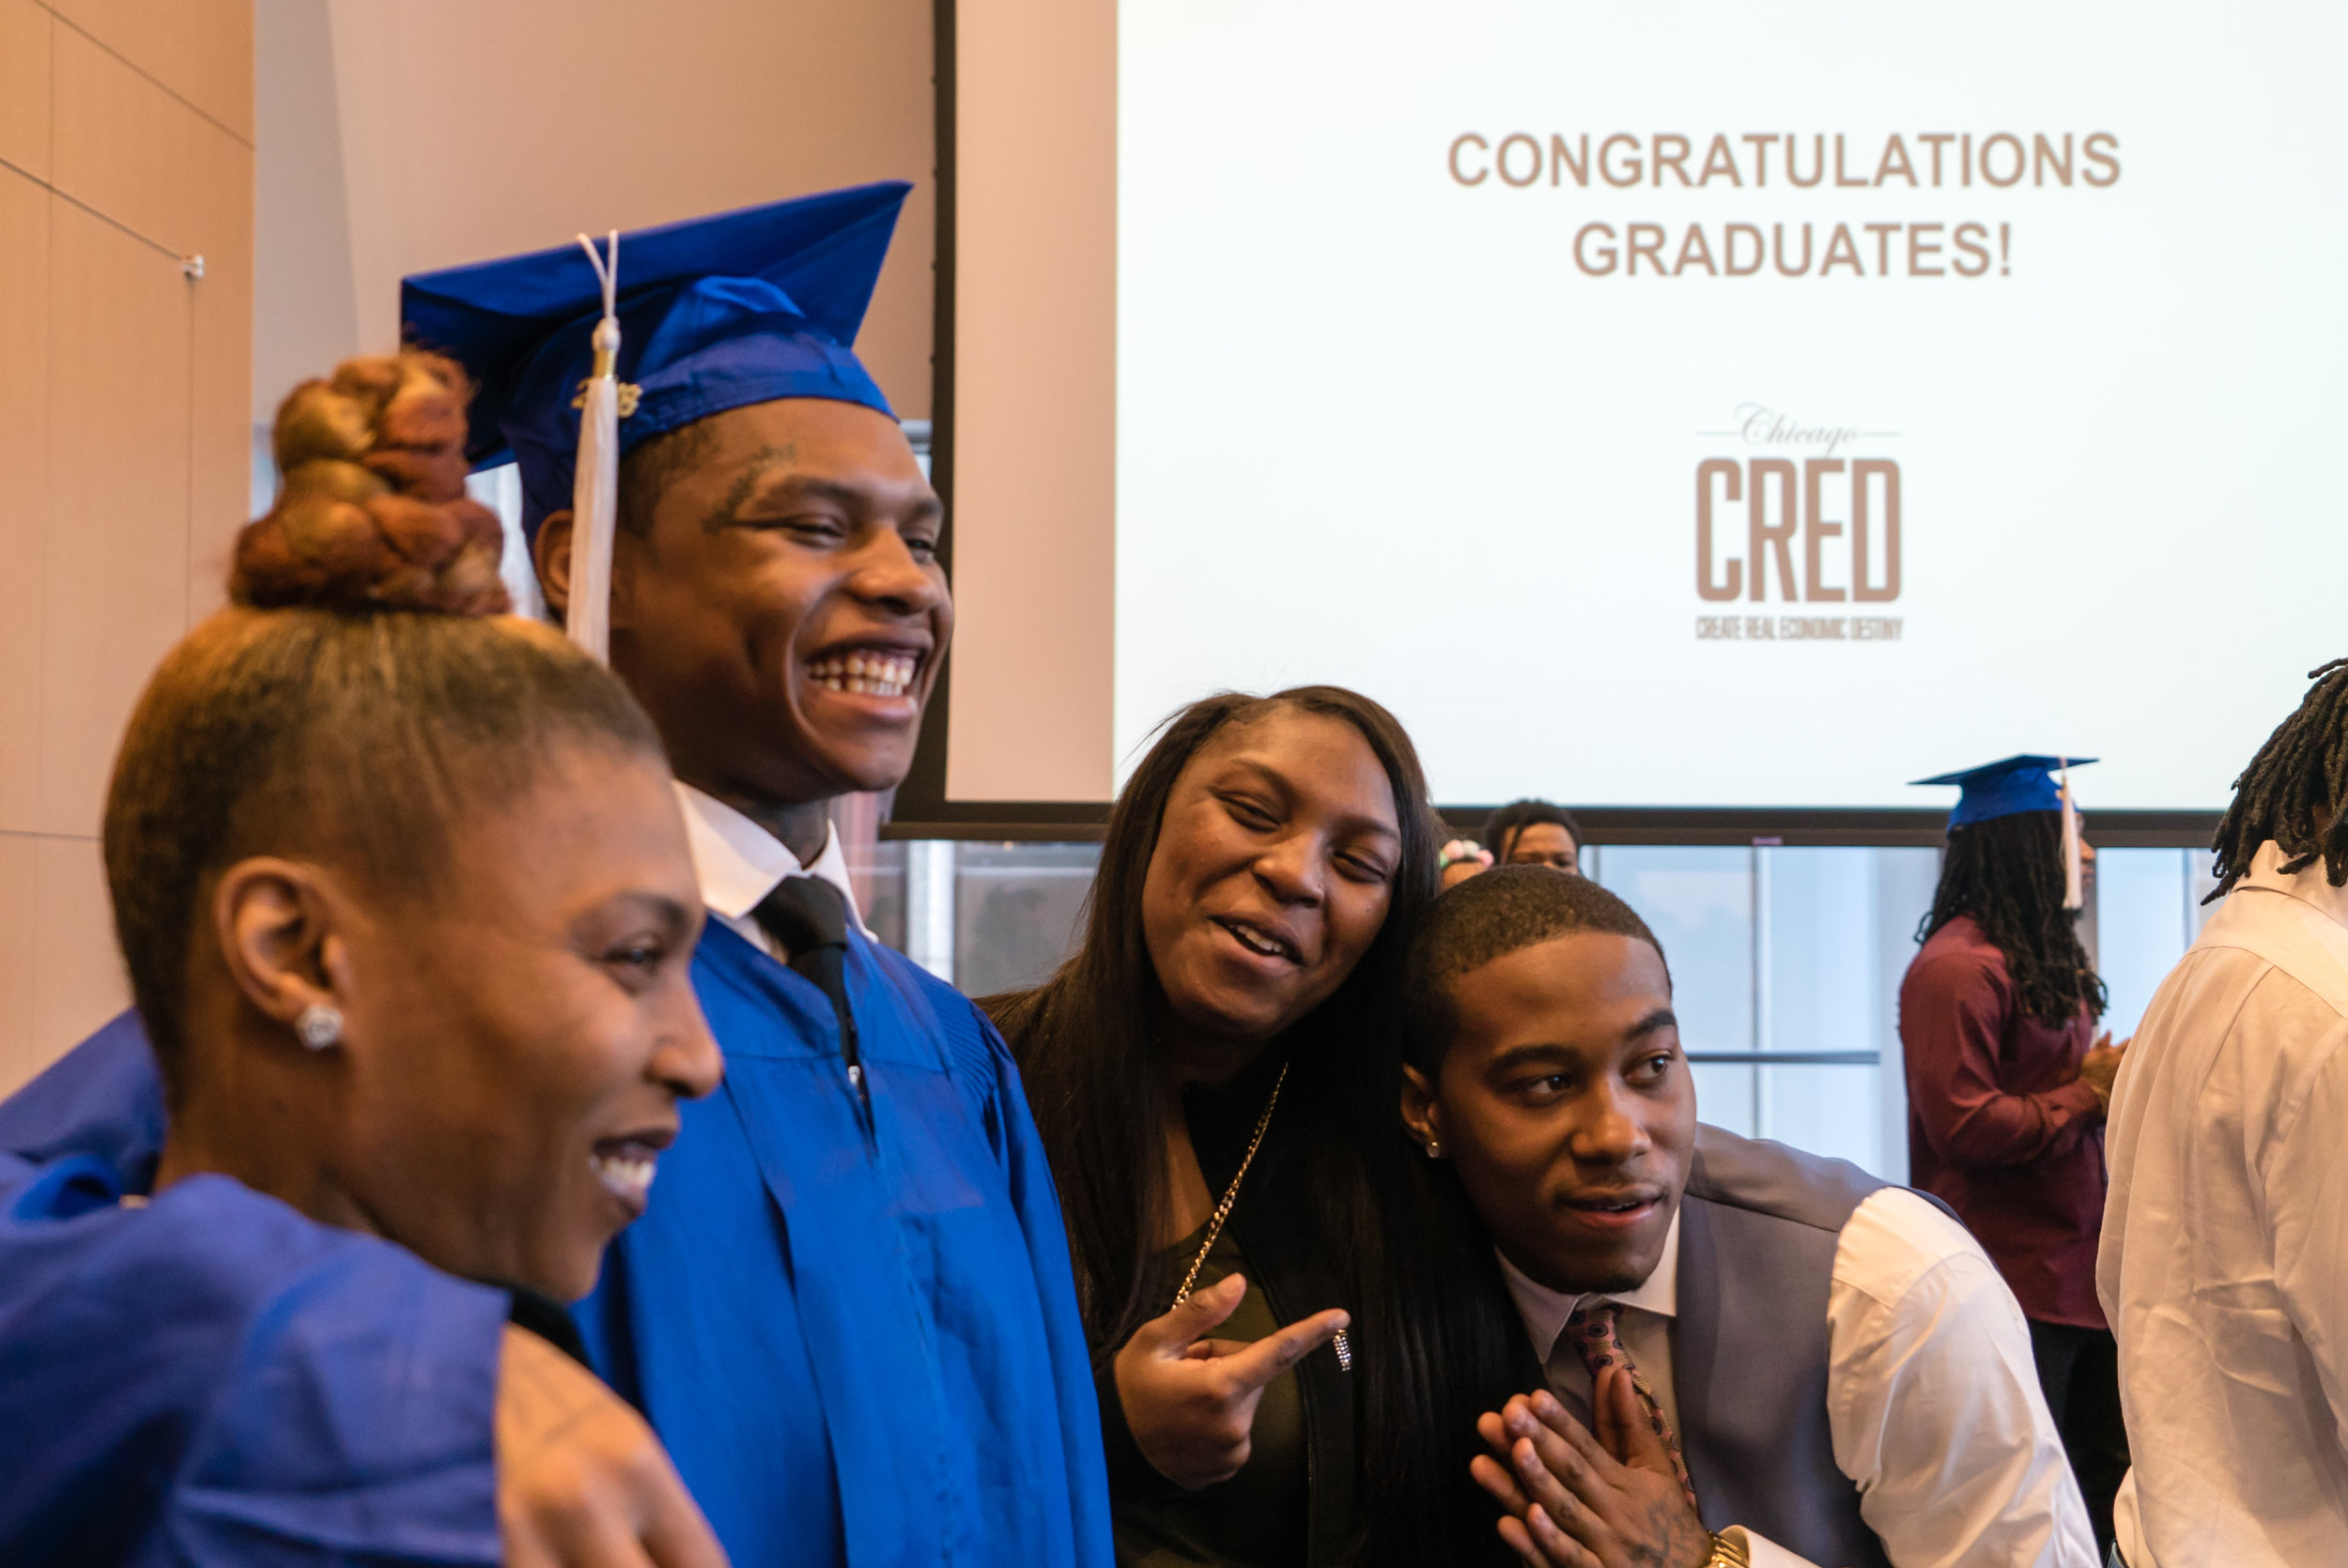 CRED_Graduation_Chicago_04062018-36.jpg